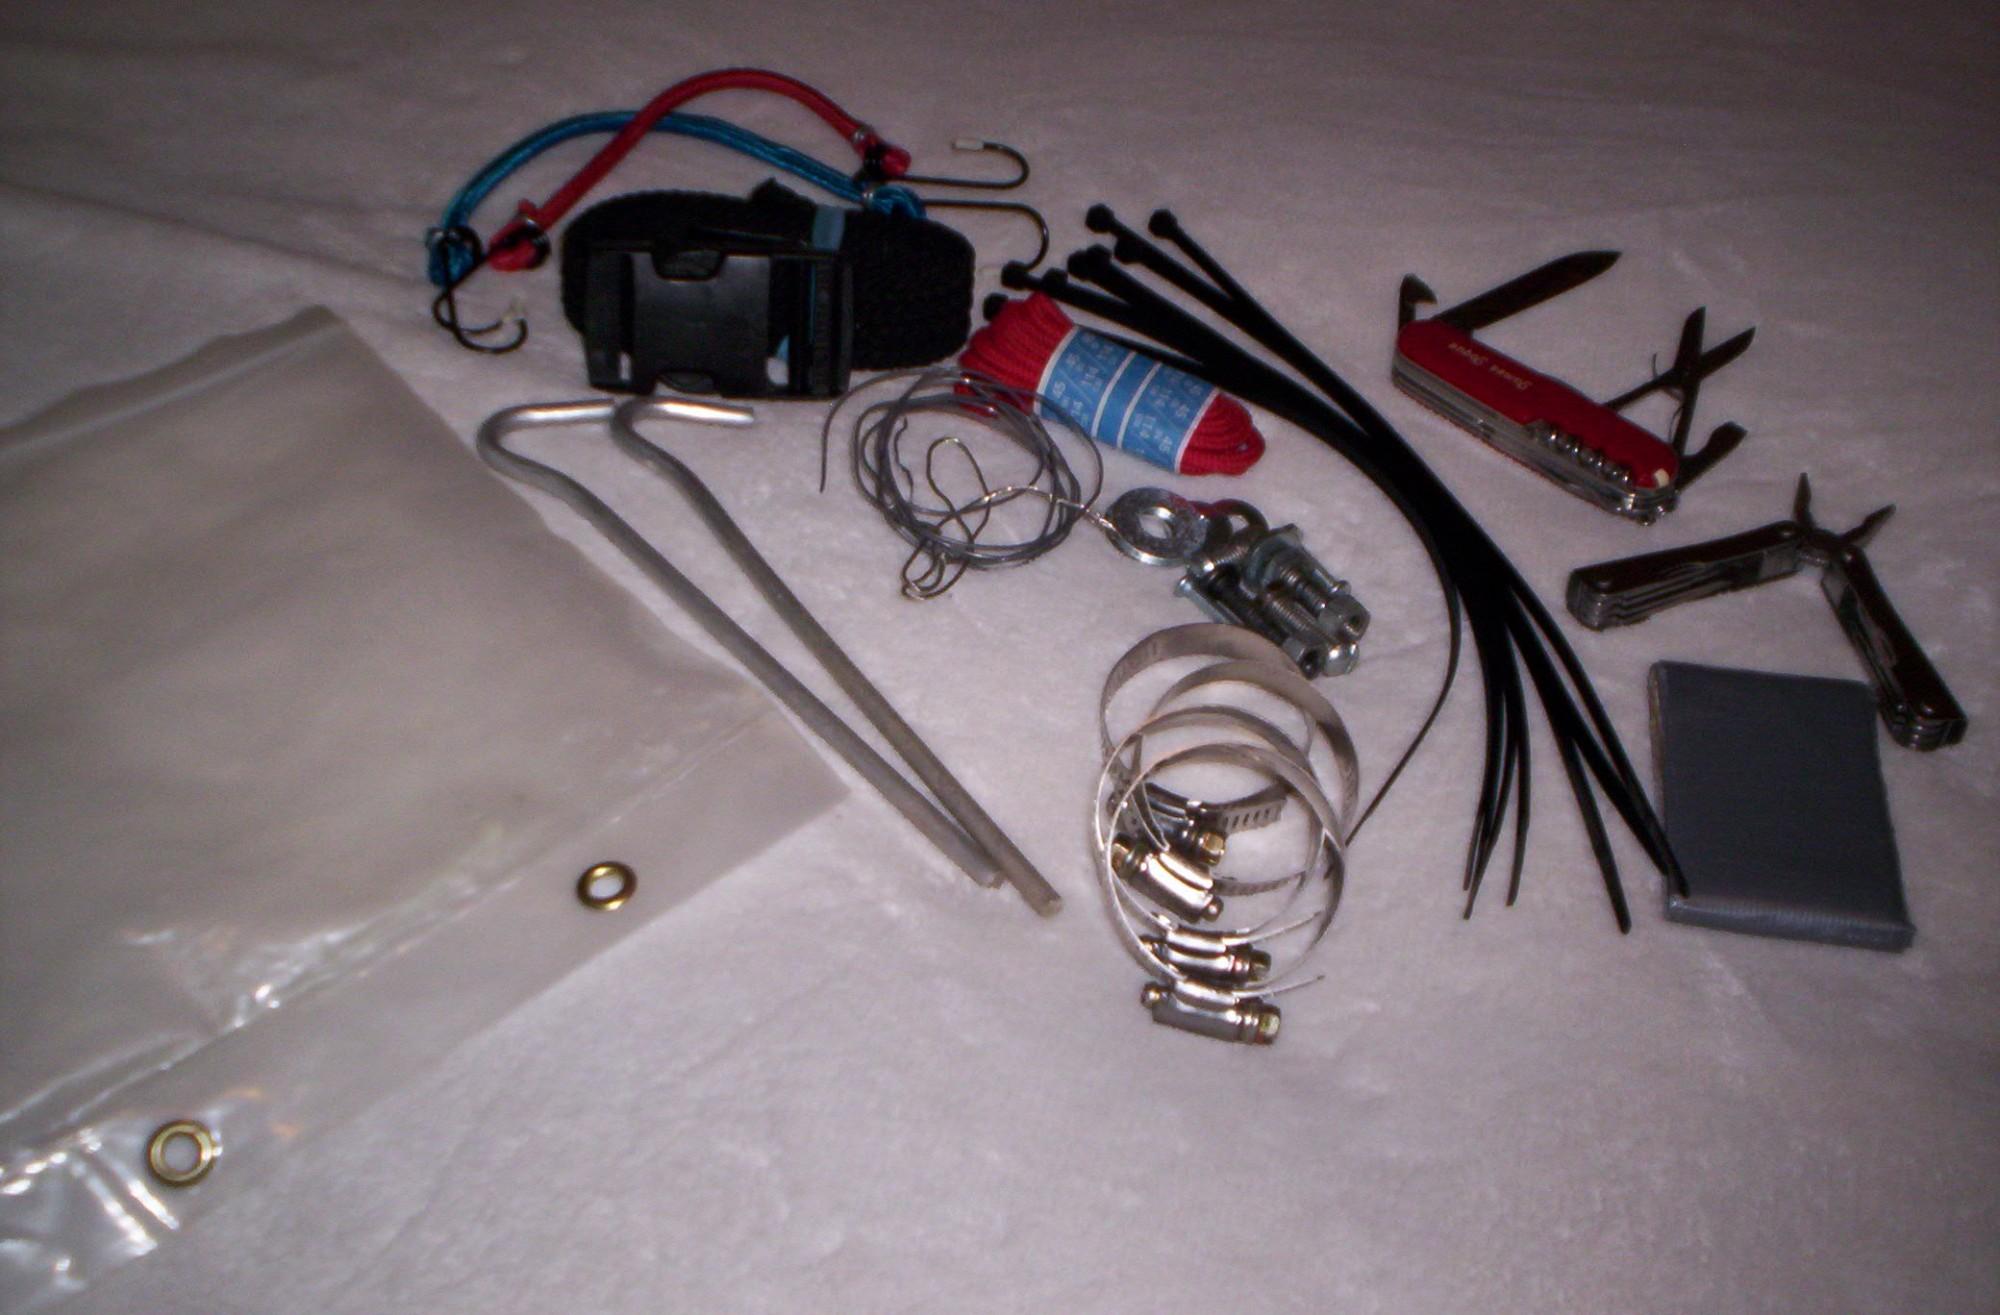 Snowshoeing Education 307: The Homemade Snowshoe Repair Kit ...